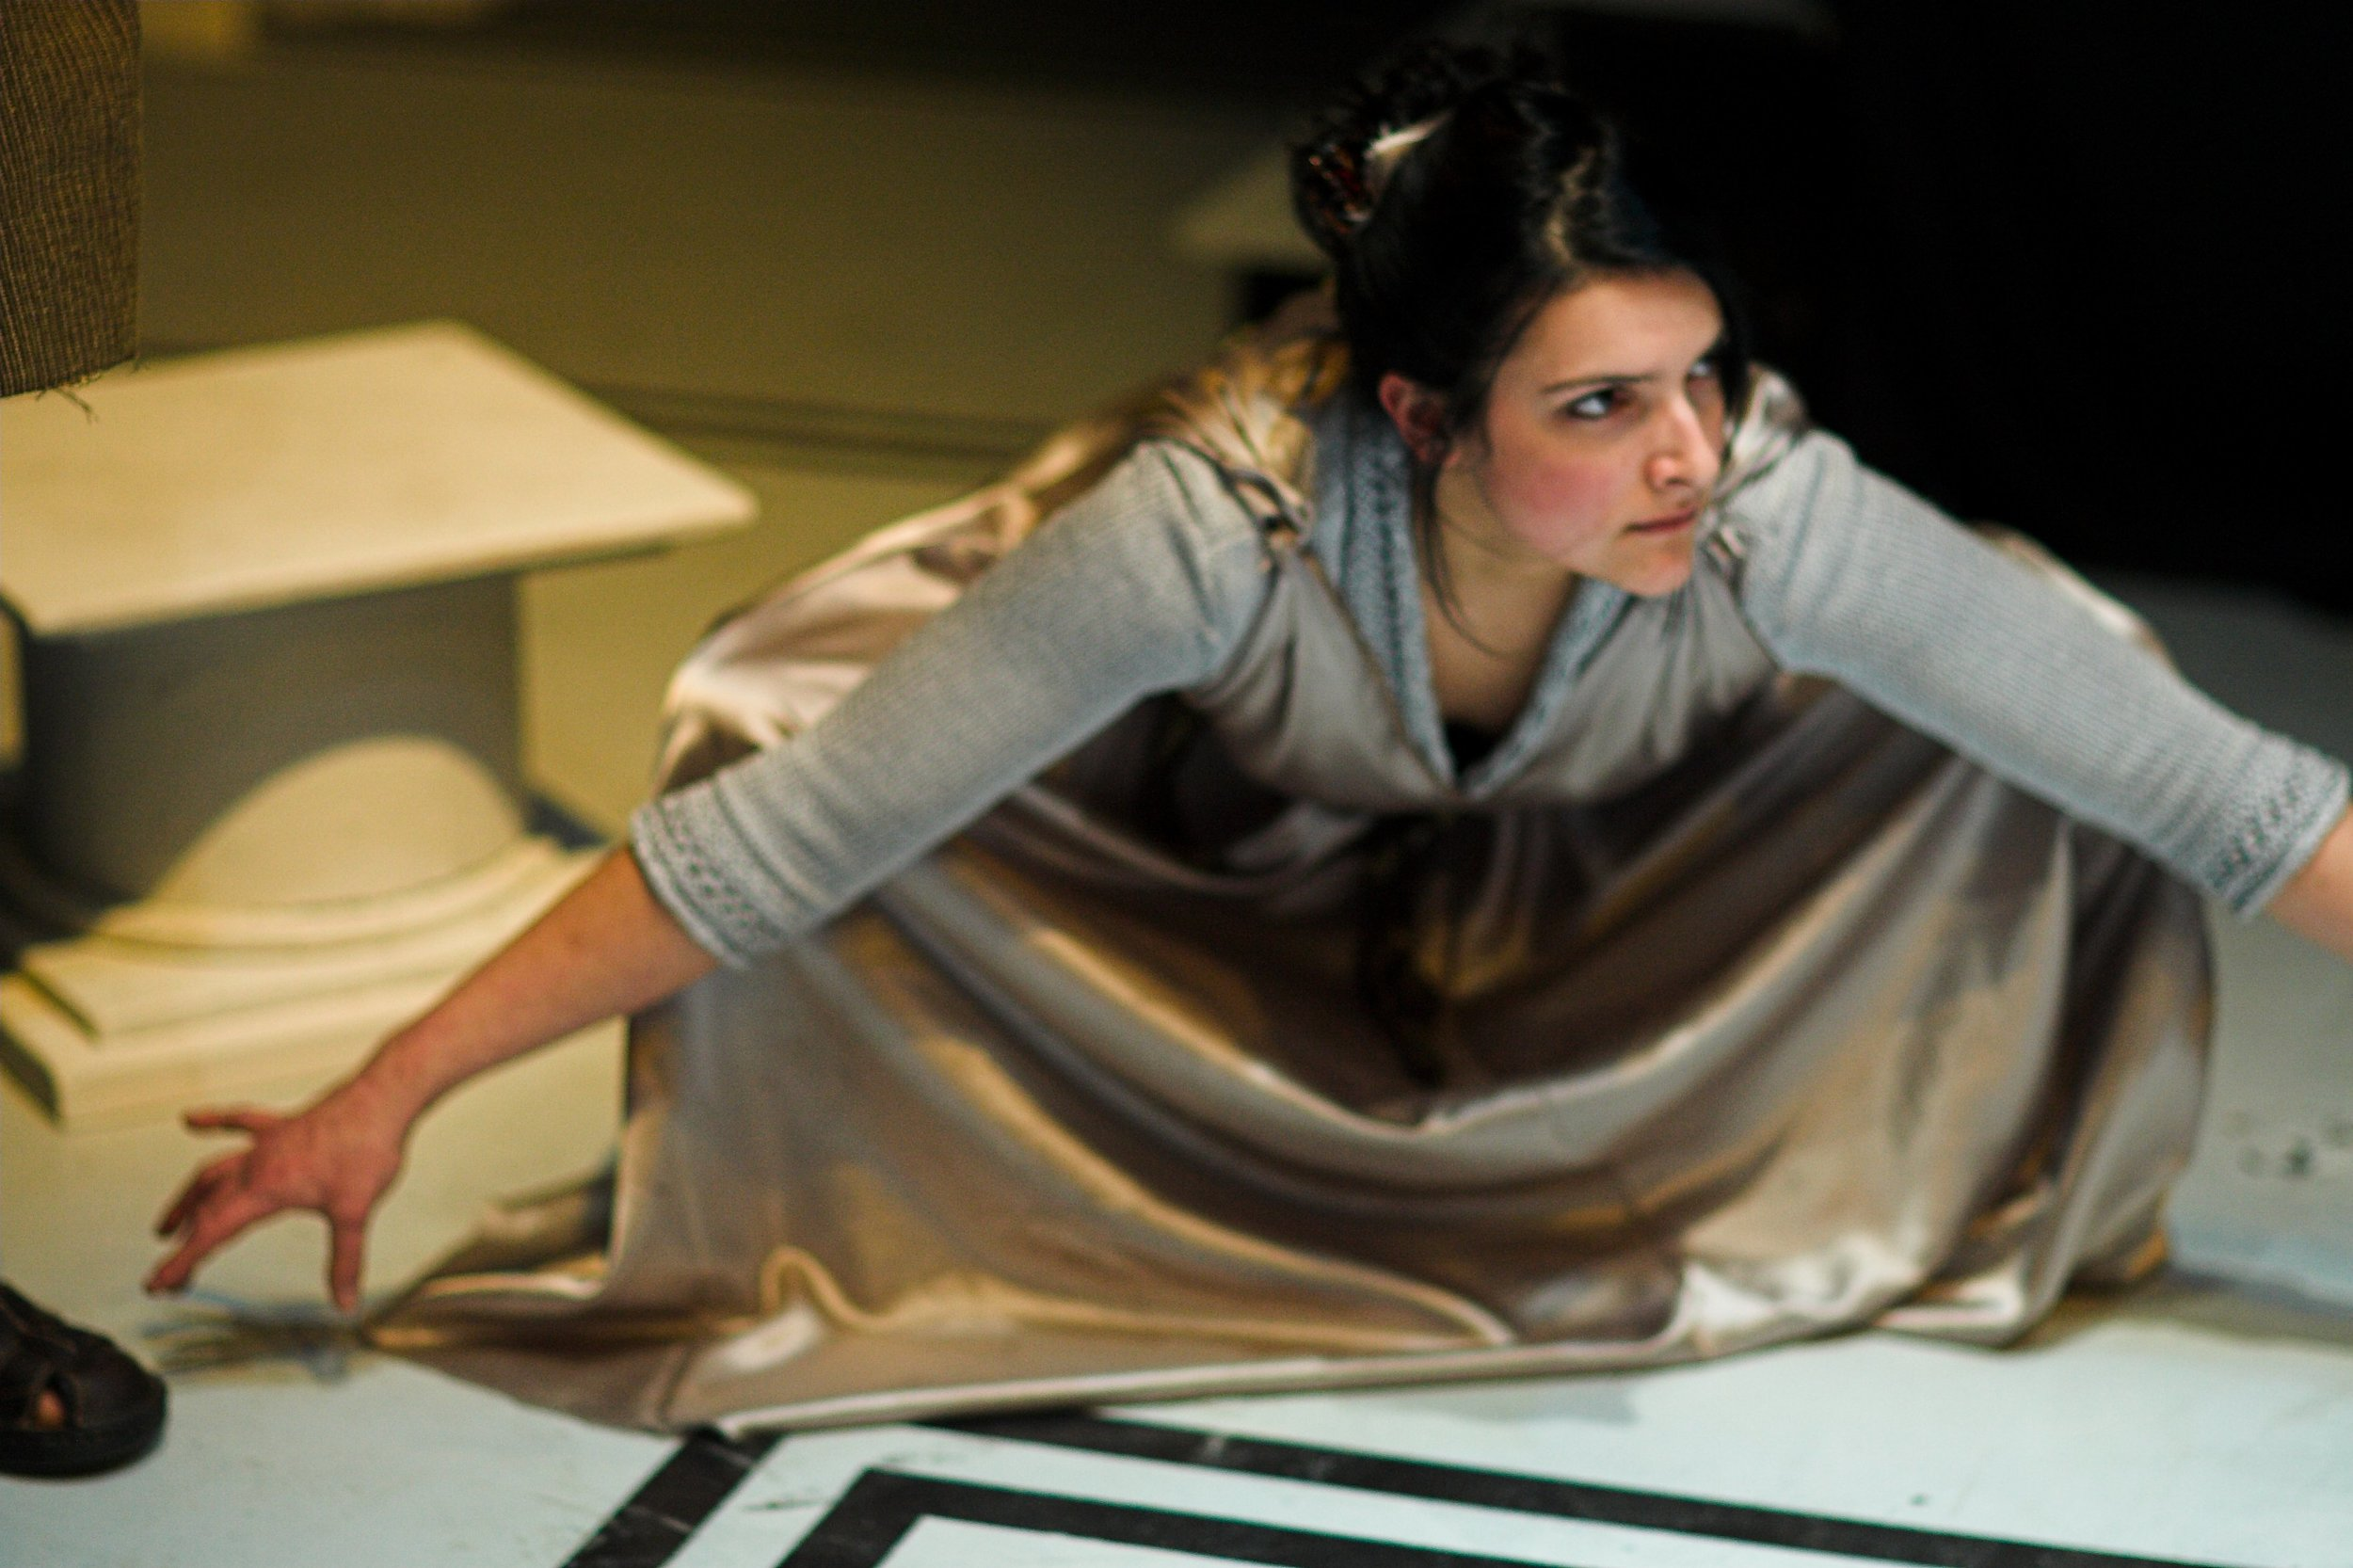 Abby Wood as Janus 2. in Washington Shakespeare Company's production, 2007. Photo: Ray Gniewek.